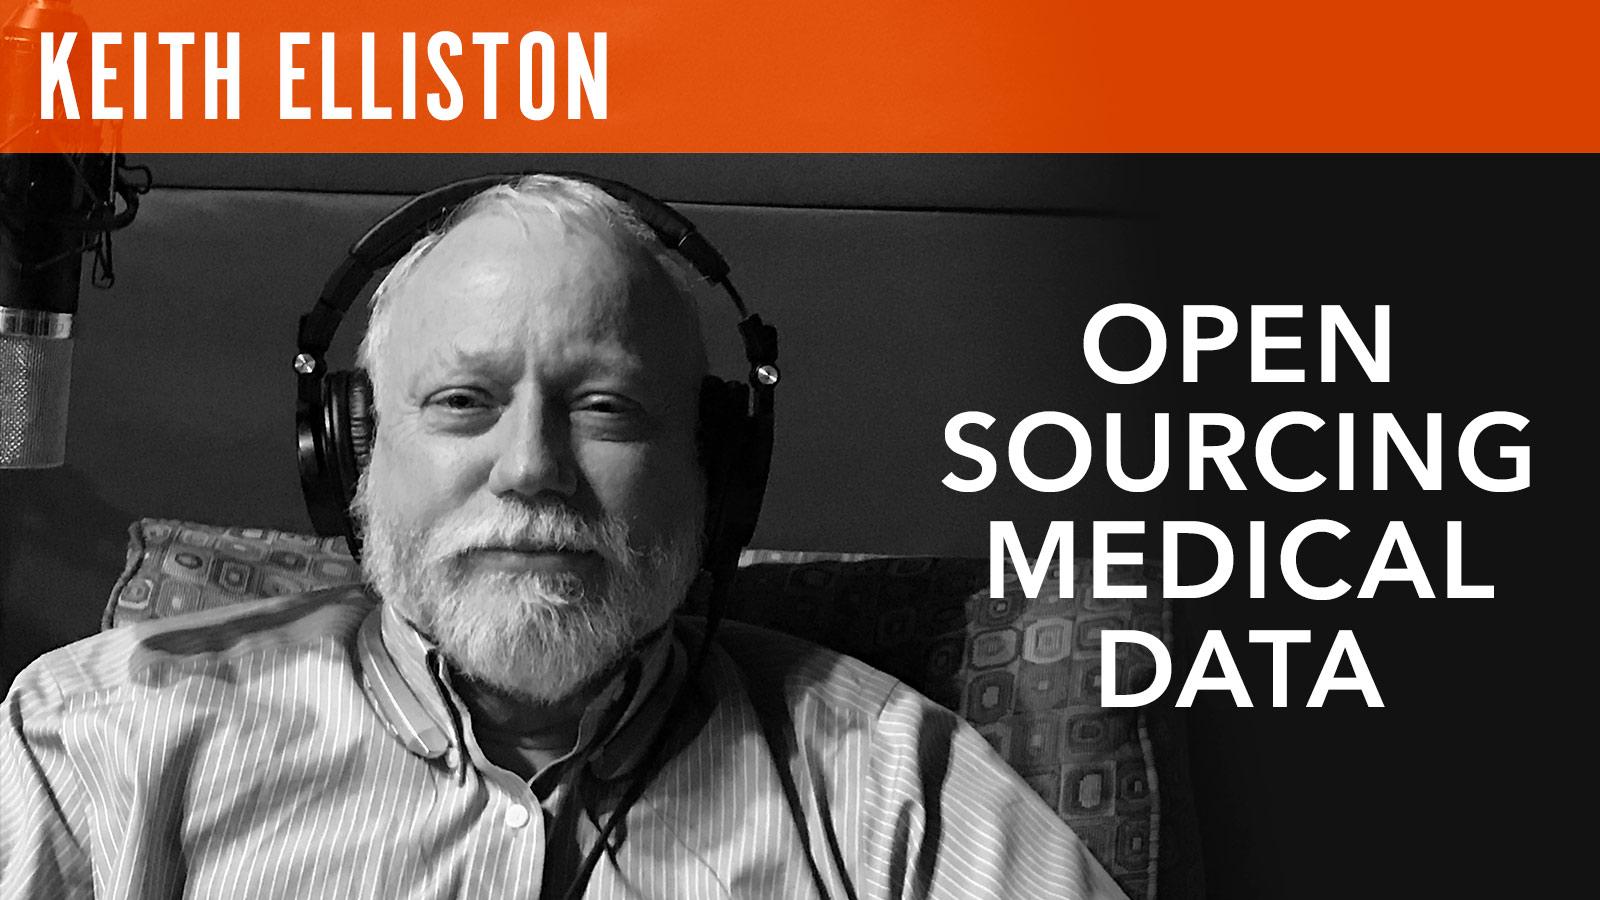 Keith Elliston  Open Sourcing Medical Data